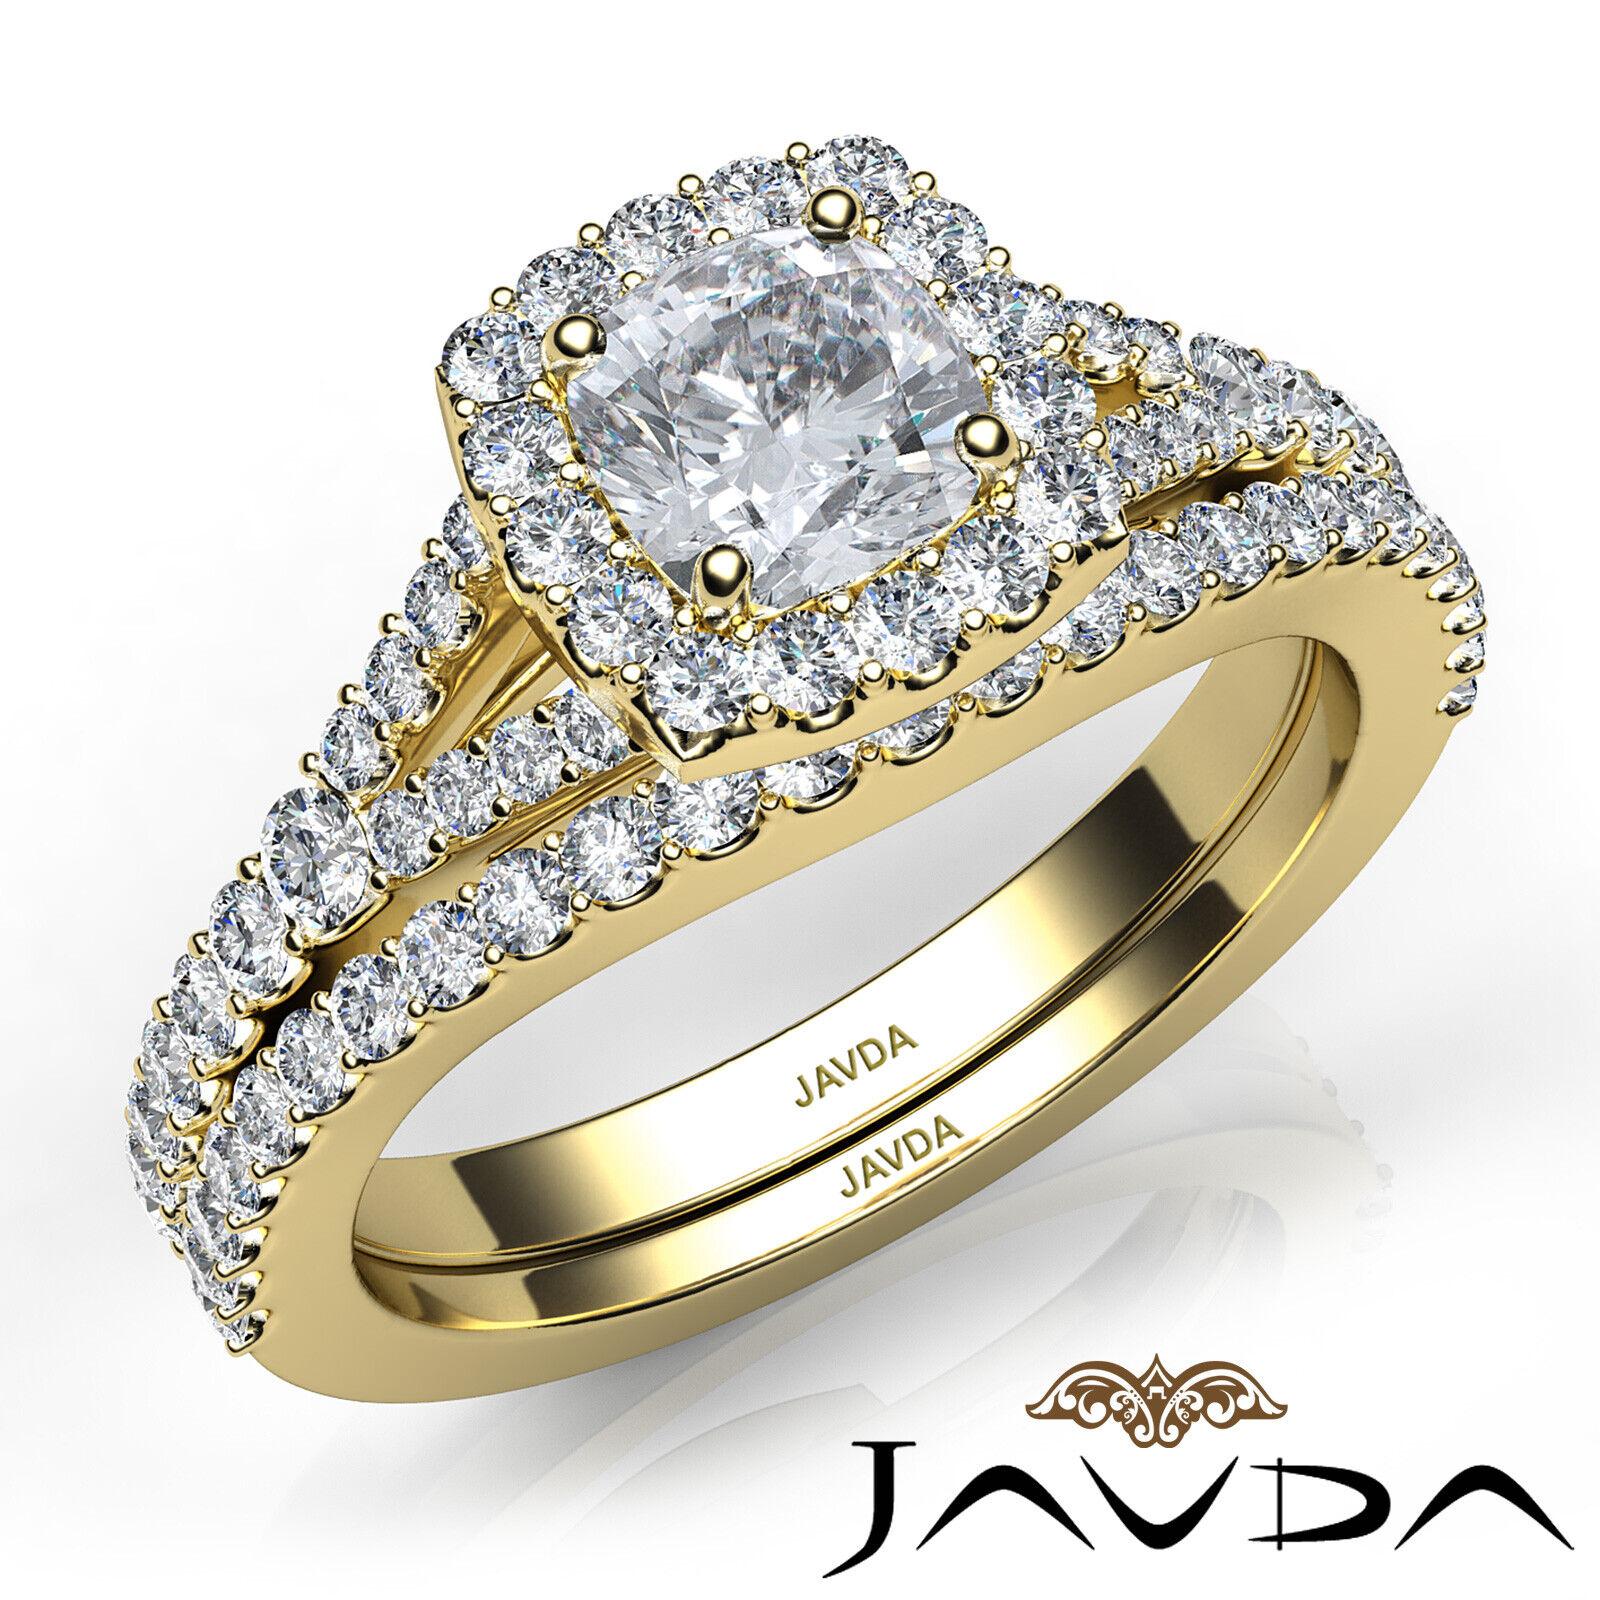 1.5ctw U Cut Pave Halo Bridal Cushion Diamond Engagement Ring GIA F-VS2 W Gold 9